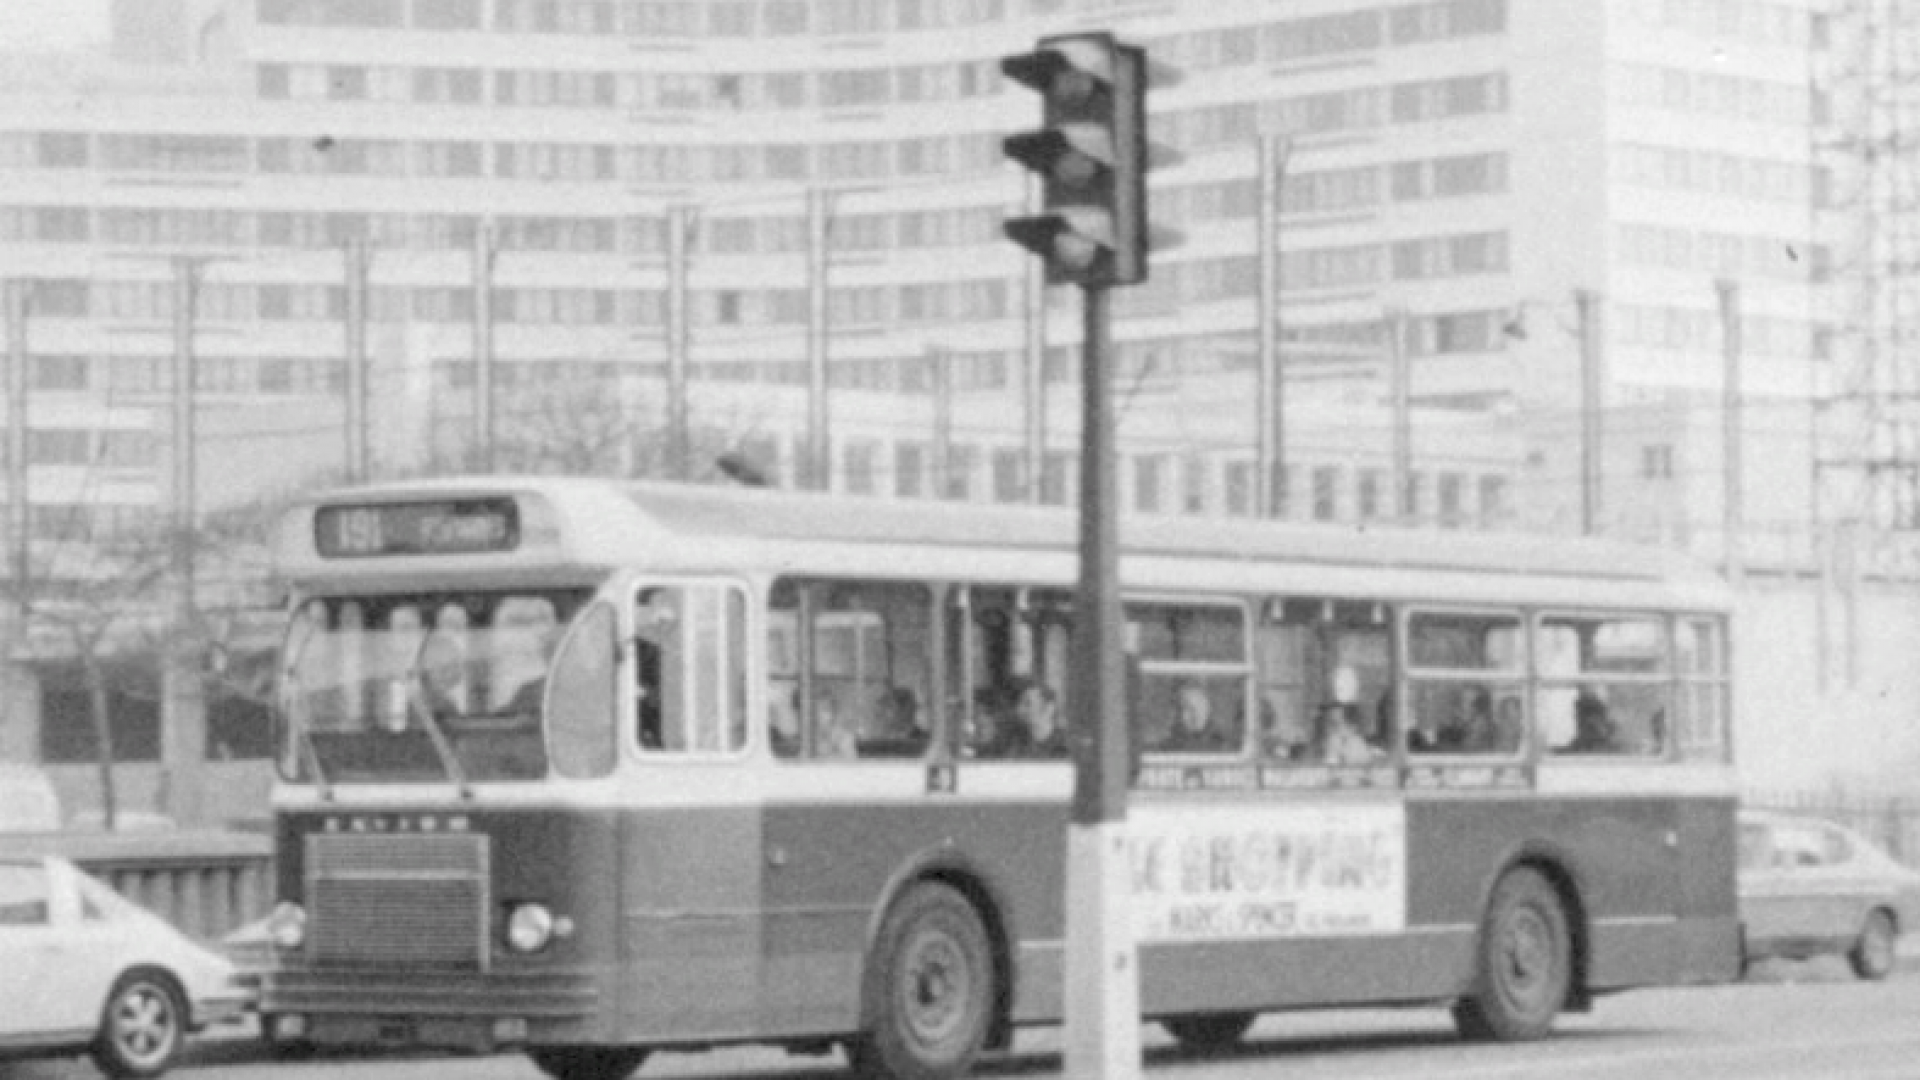 CineA-1975-63-Malakoff75-2_8